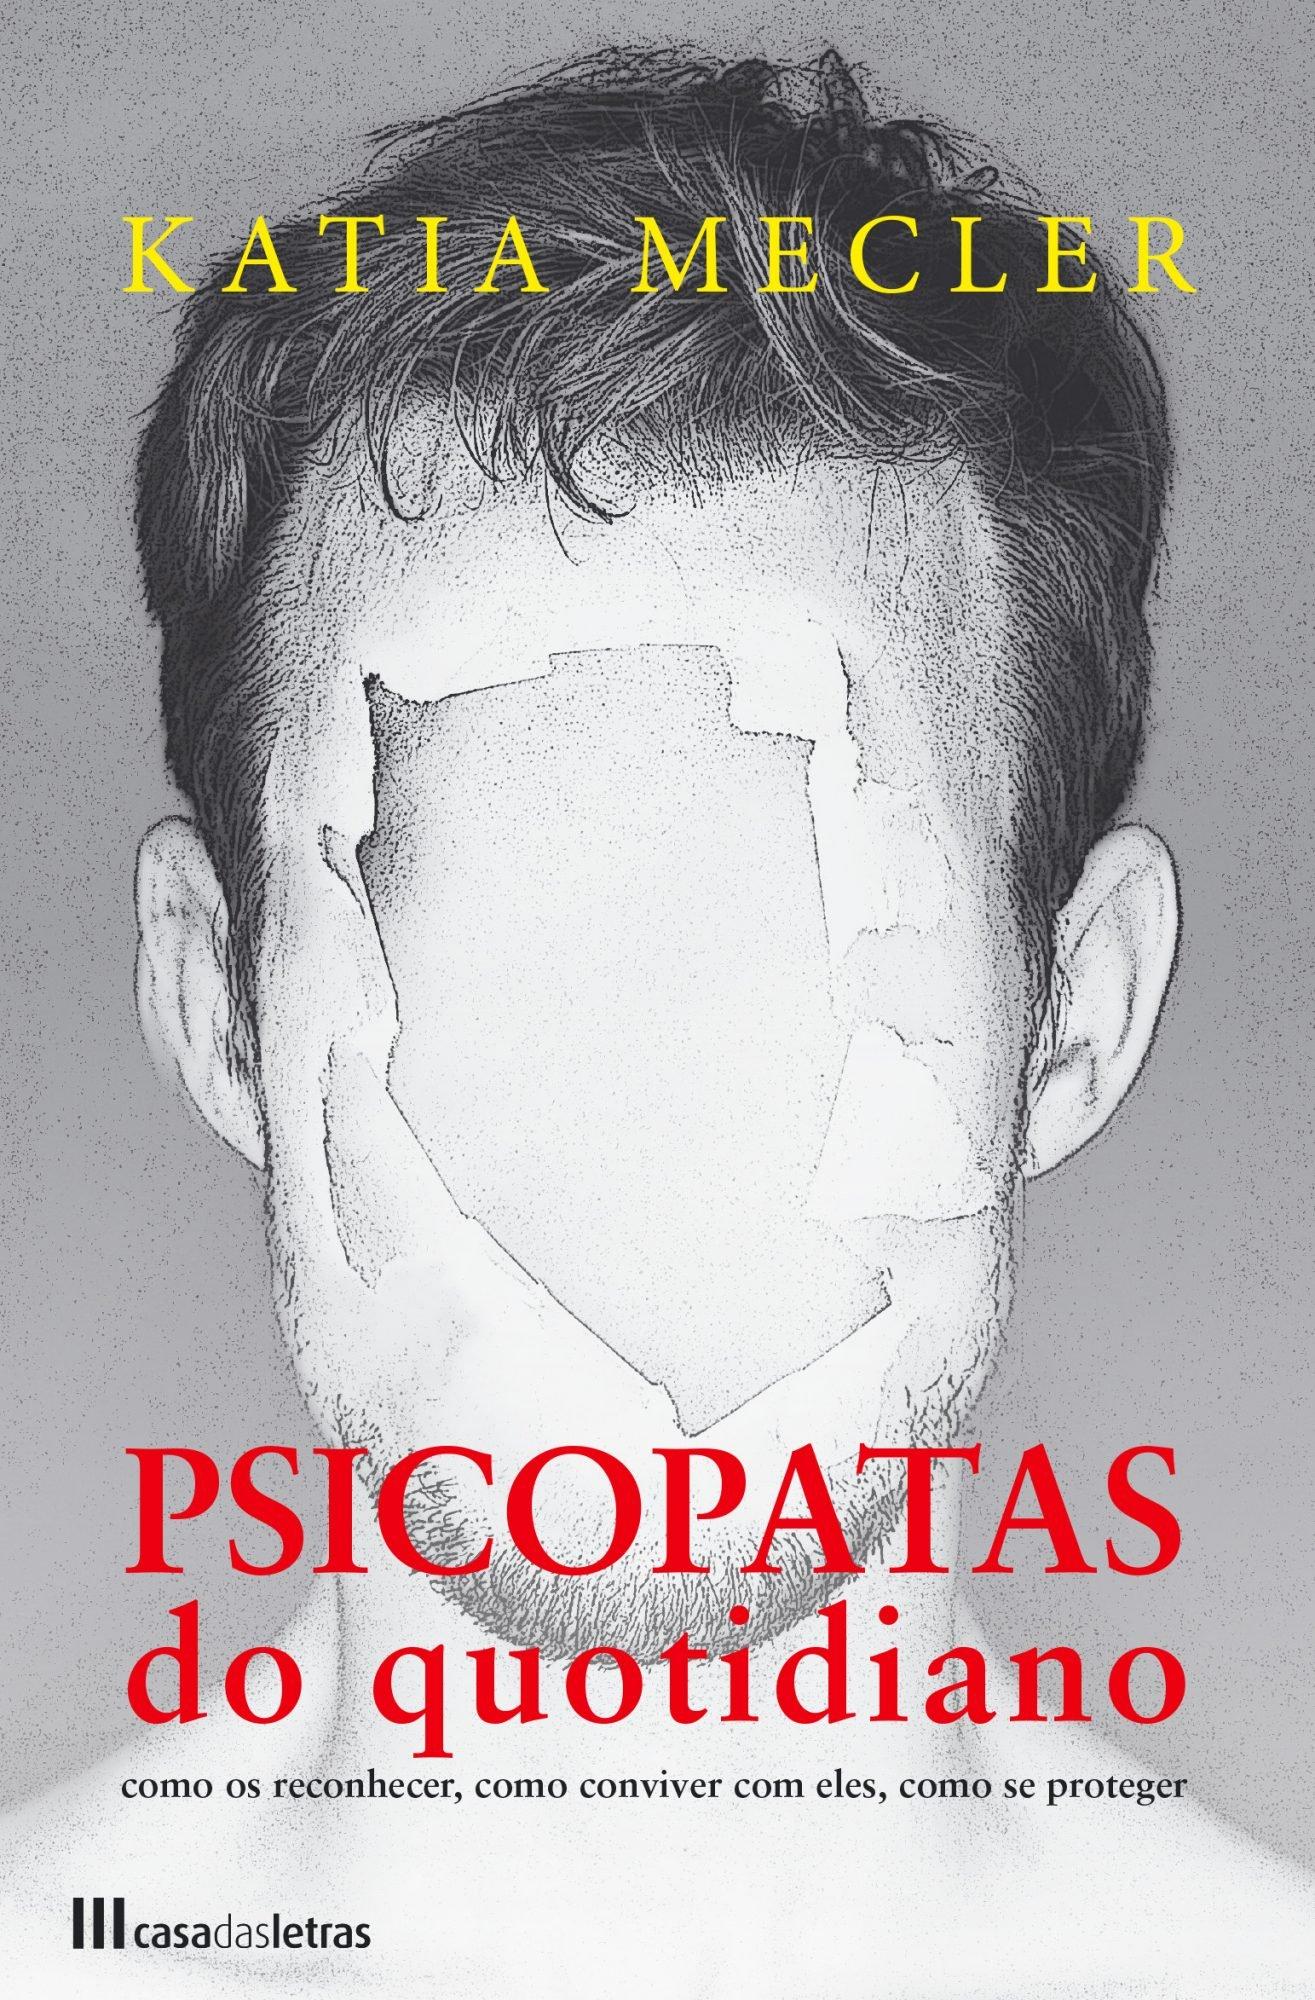 psicopatas_do_quotidiano